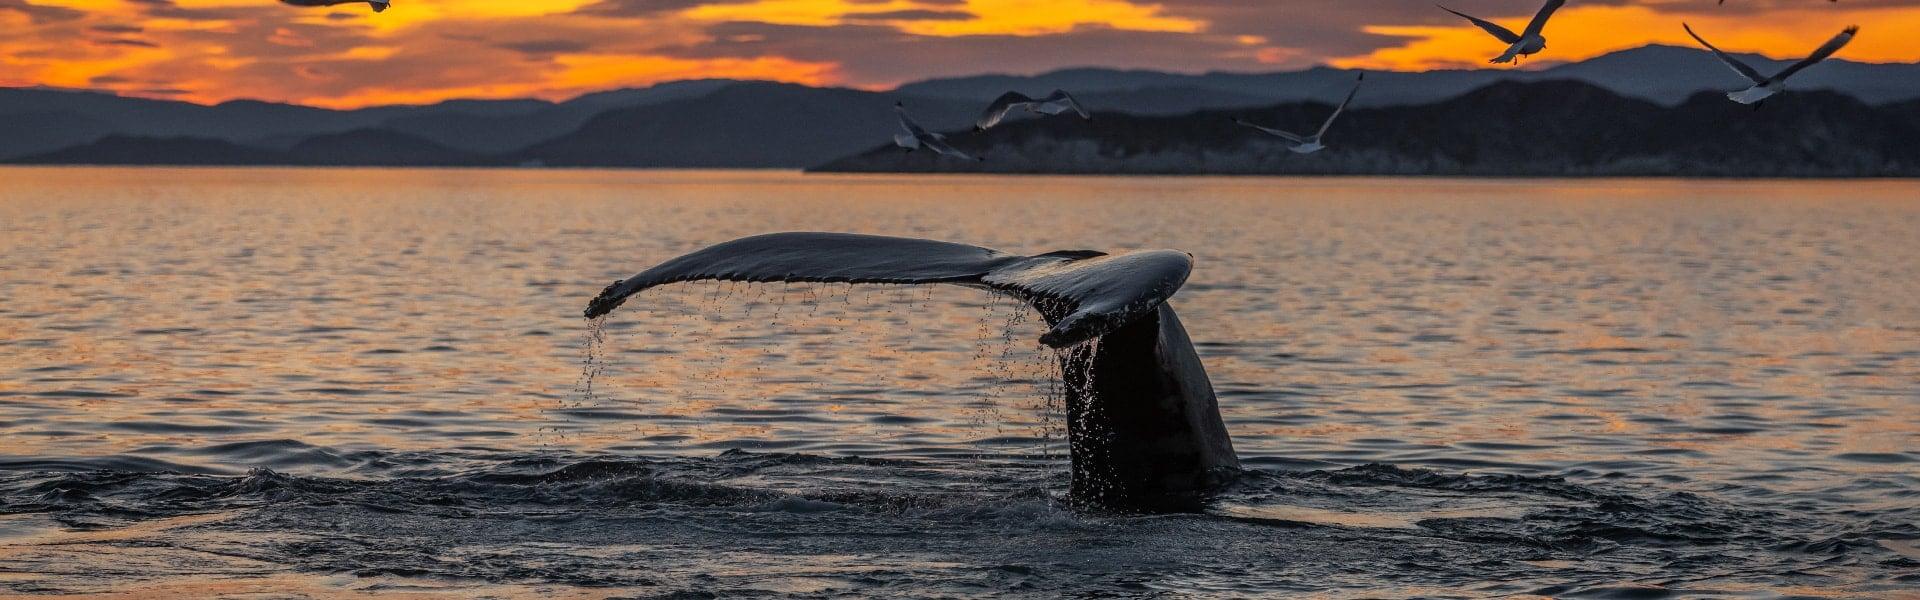 Whale Watching – Downtown Reykjavík